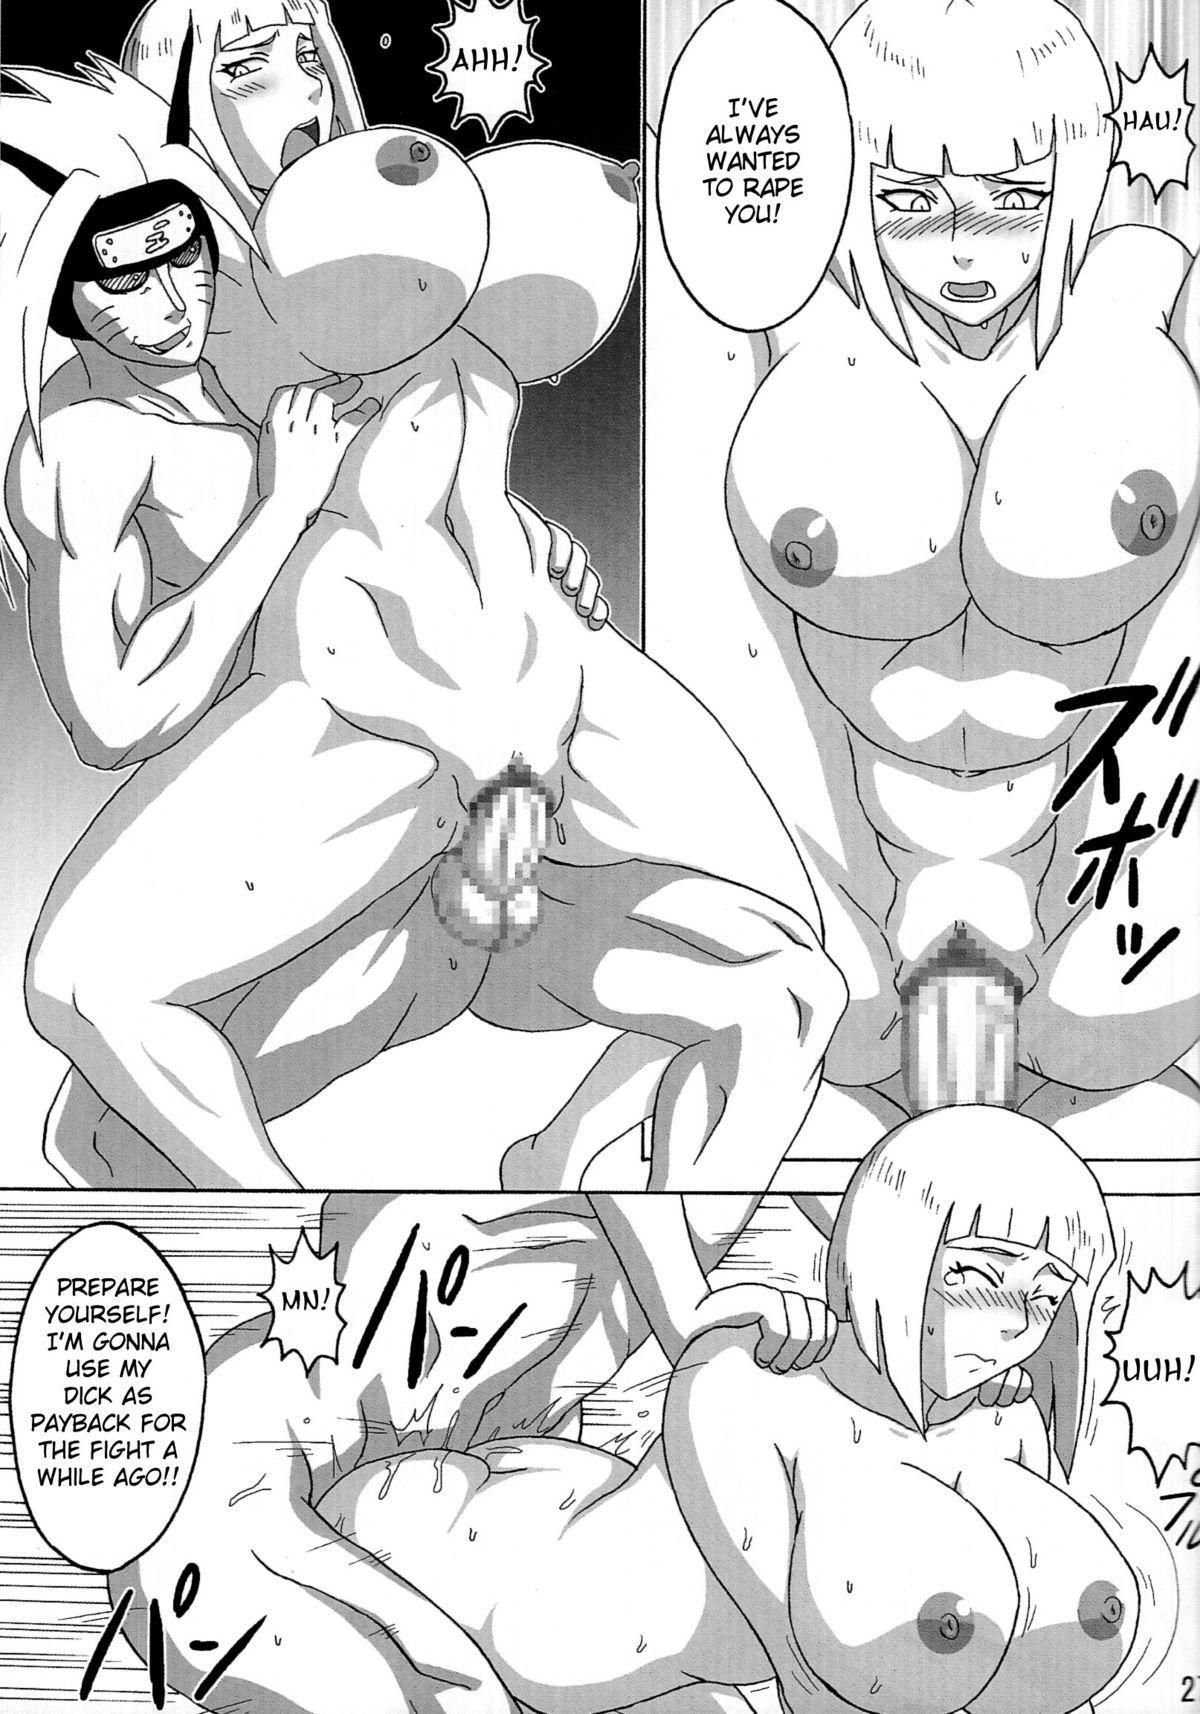 Taikan Kyonyou Shugi | Huge Breasts Rapists 27